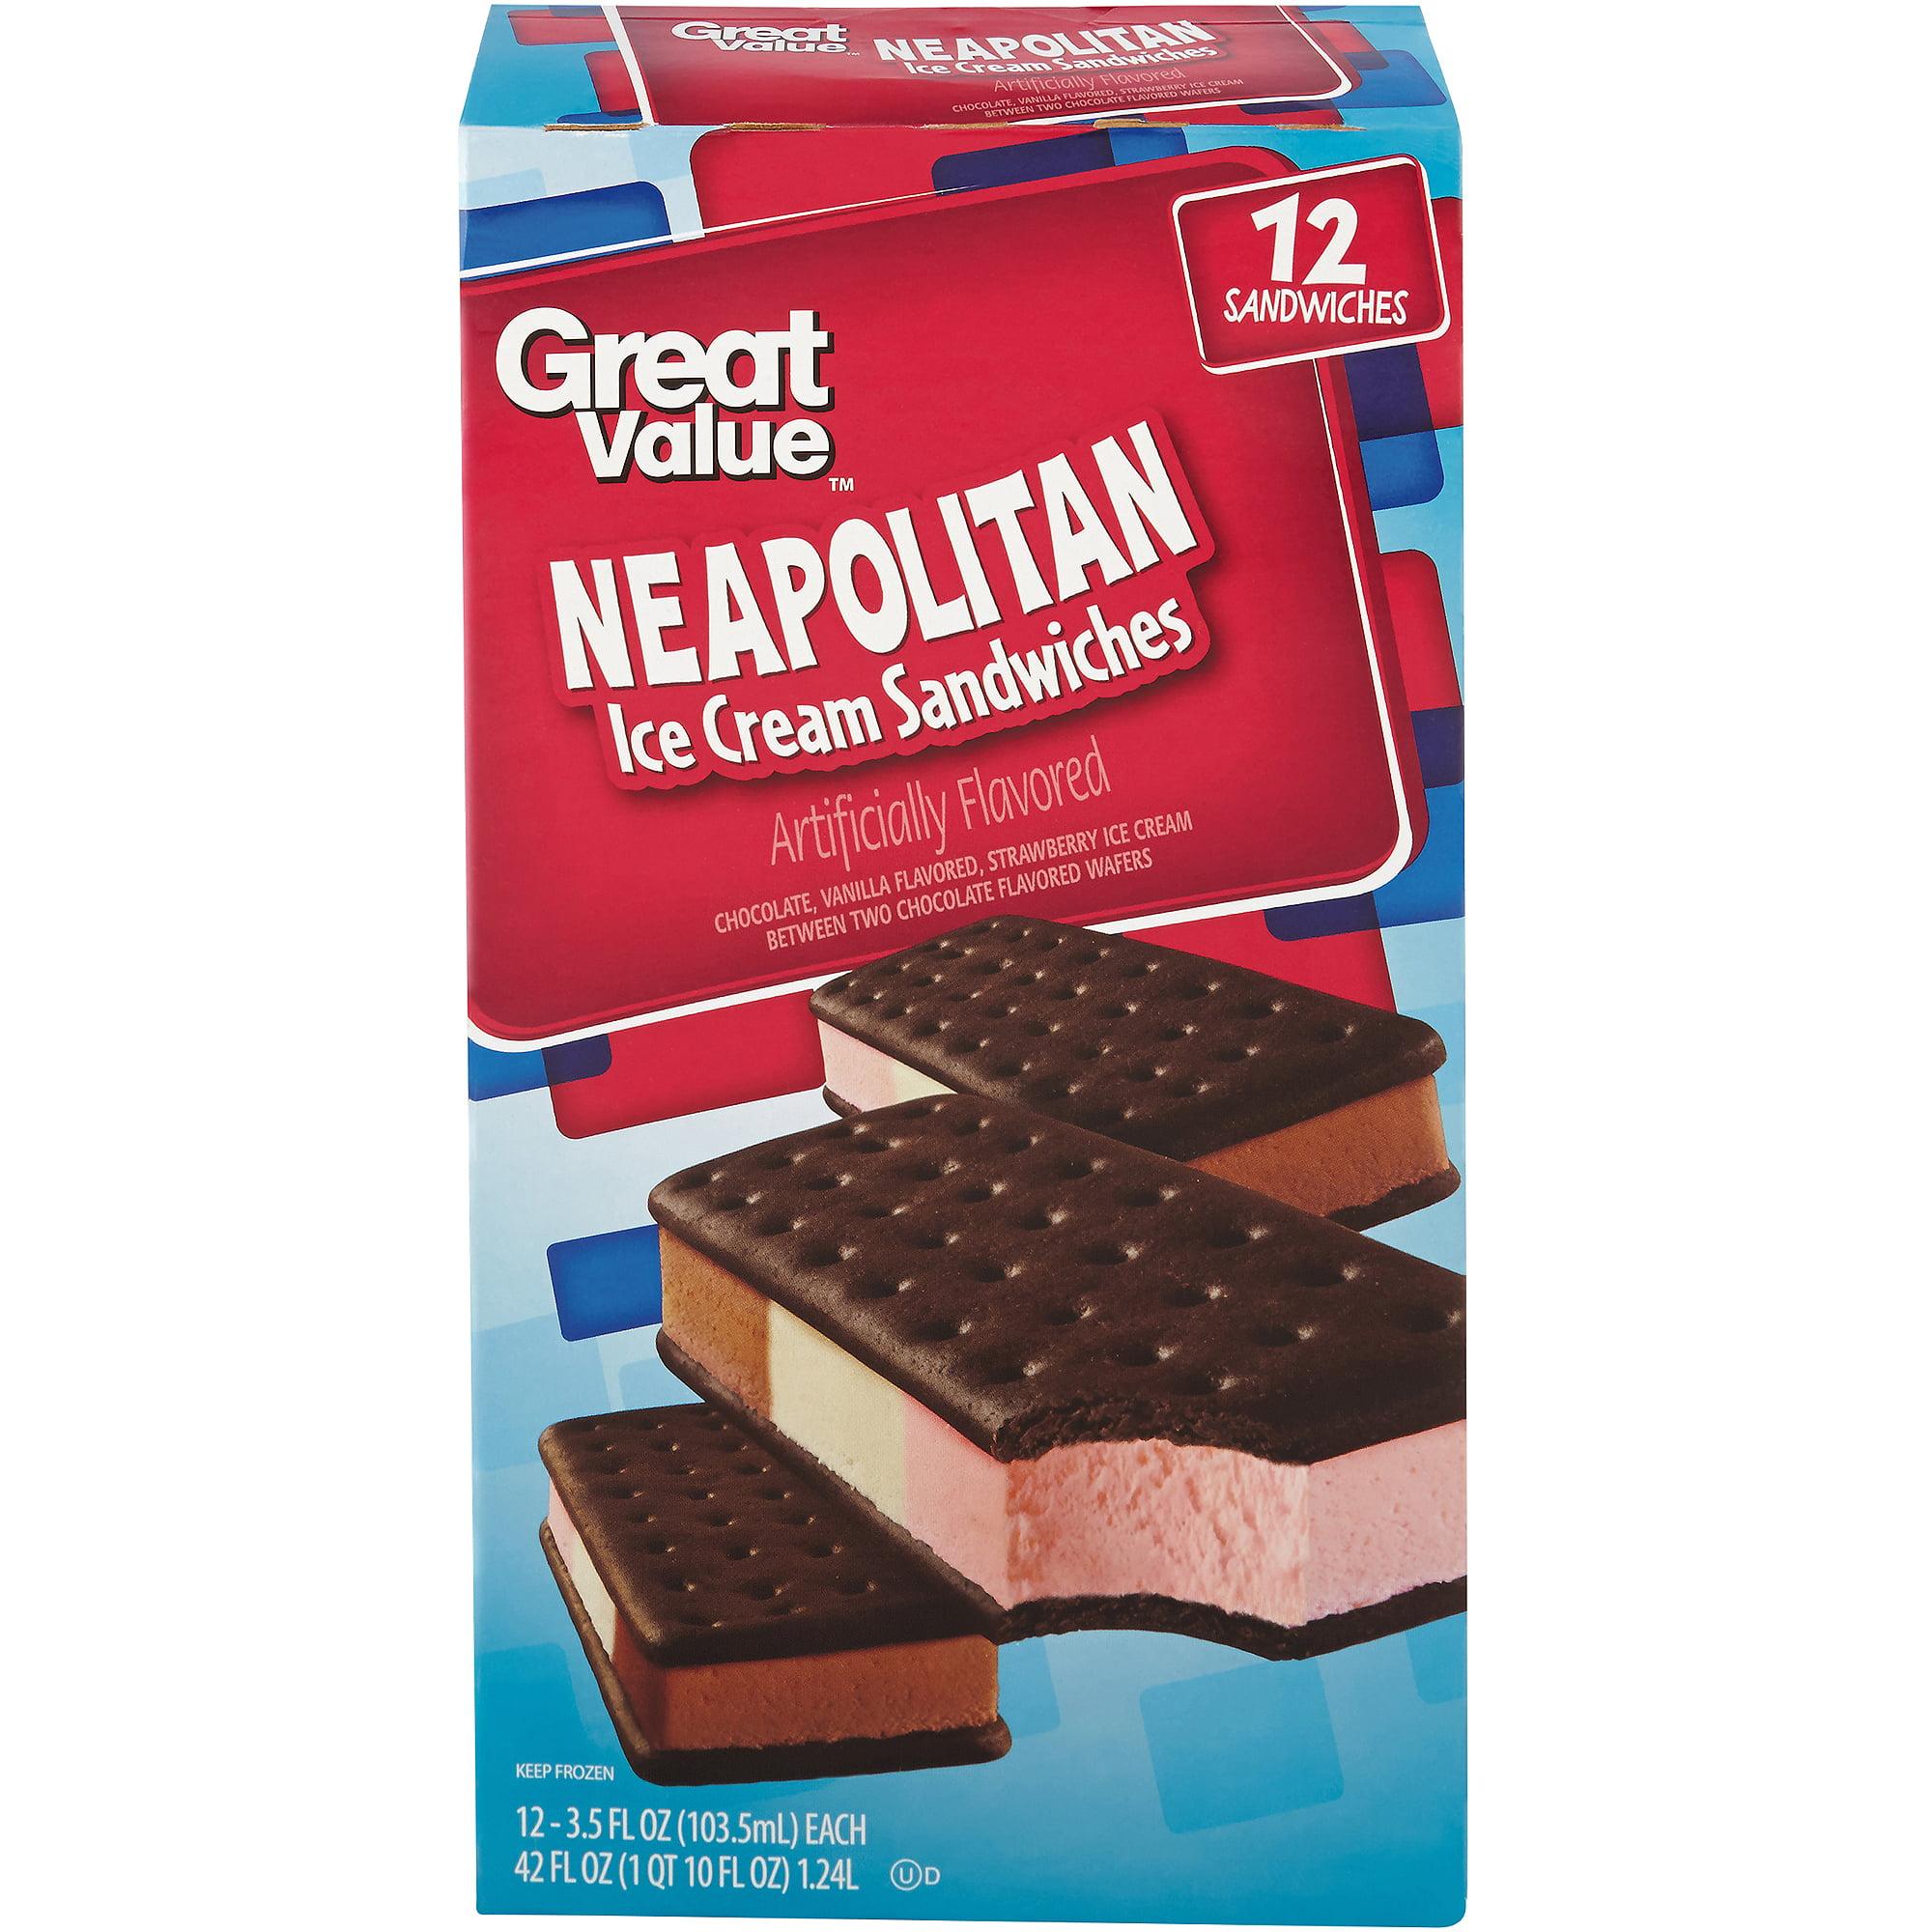 Great Value Neapolitan Ice Cream Sandwiches, 3.5 oz, 12 count